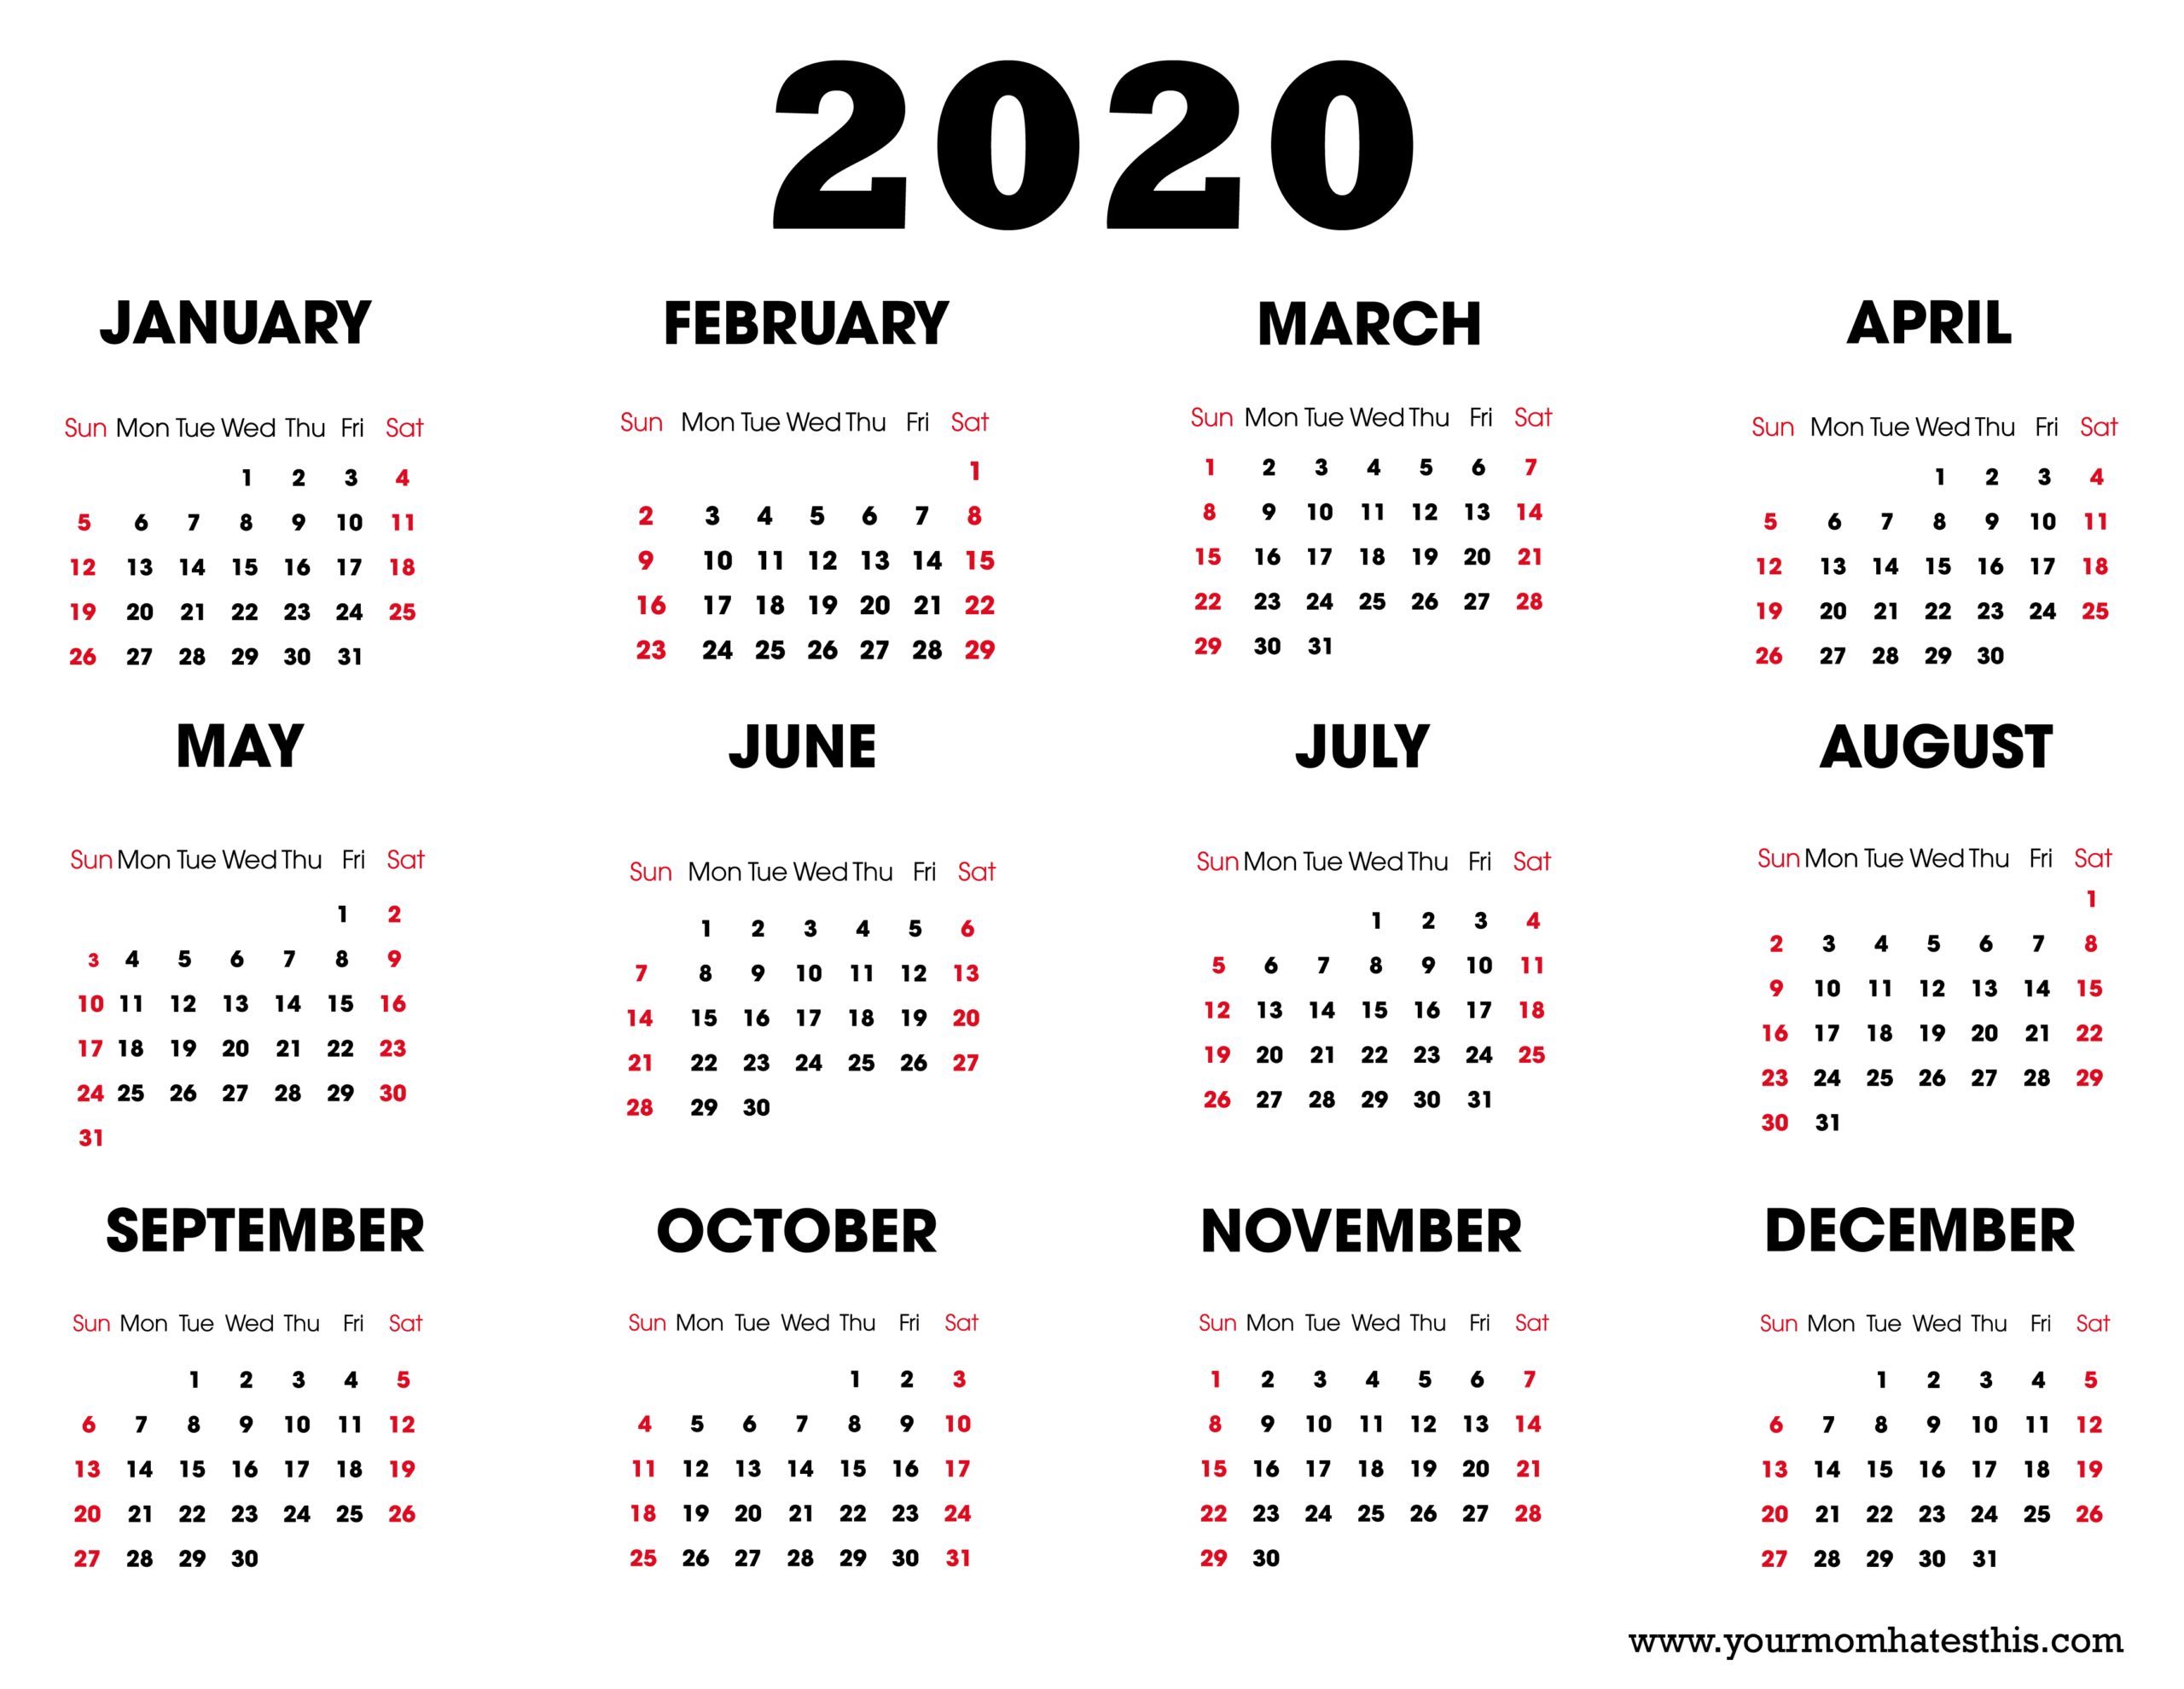 Depo Provera Leap Year Calendar 2021